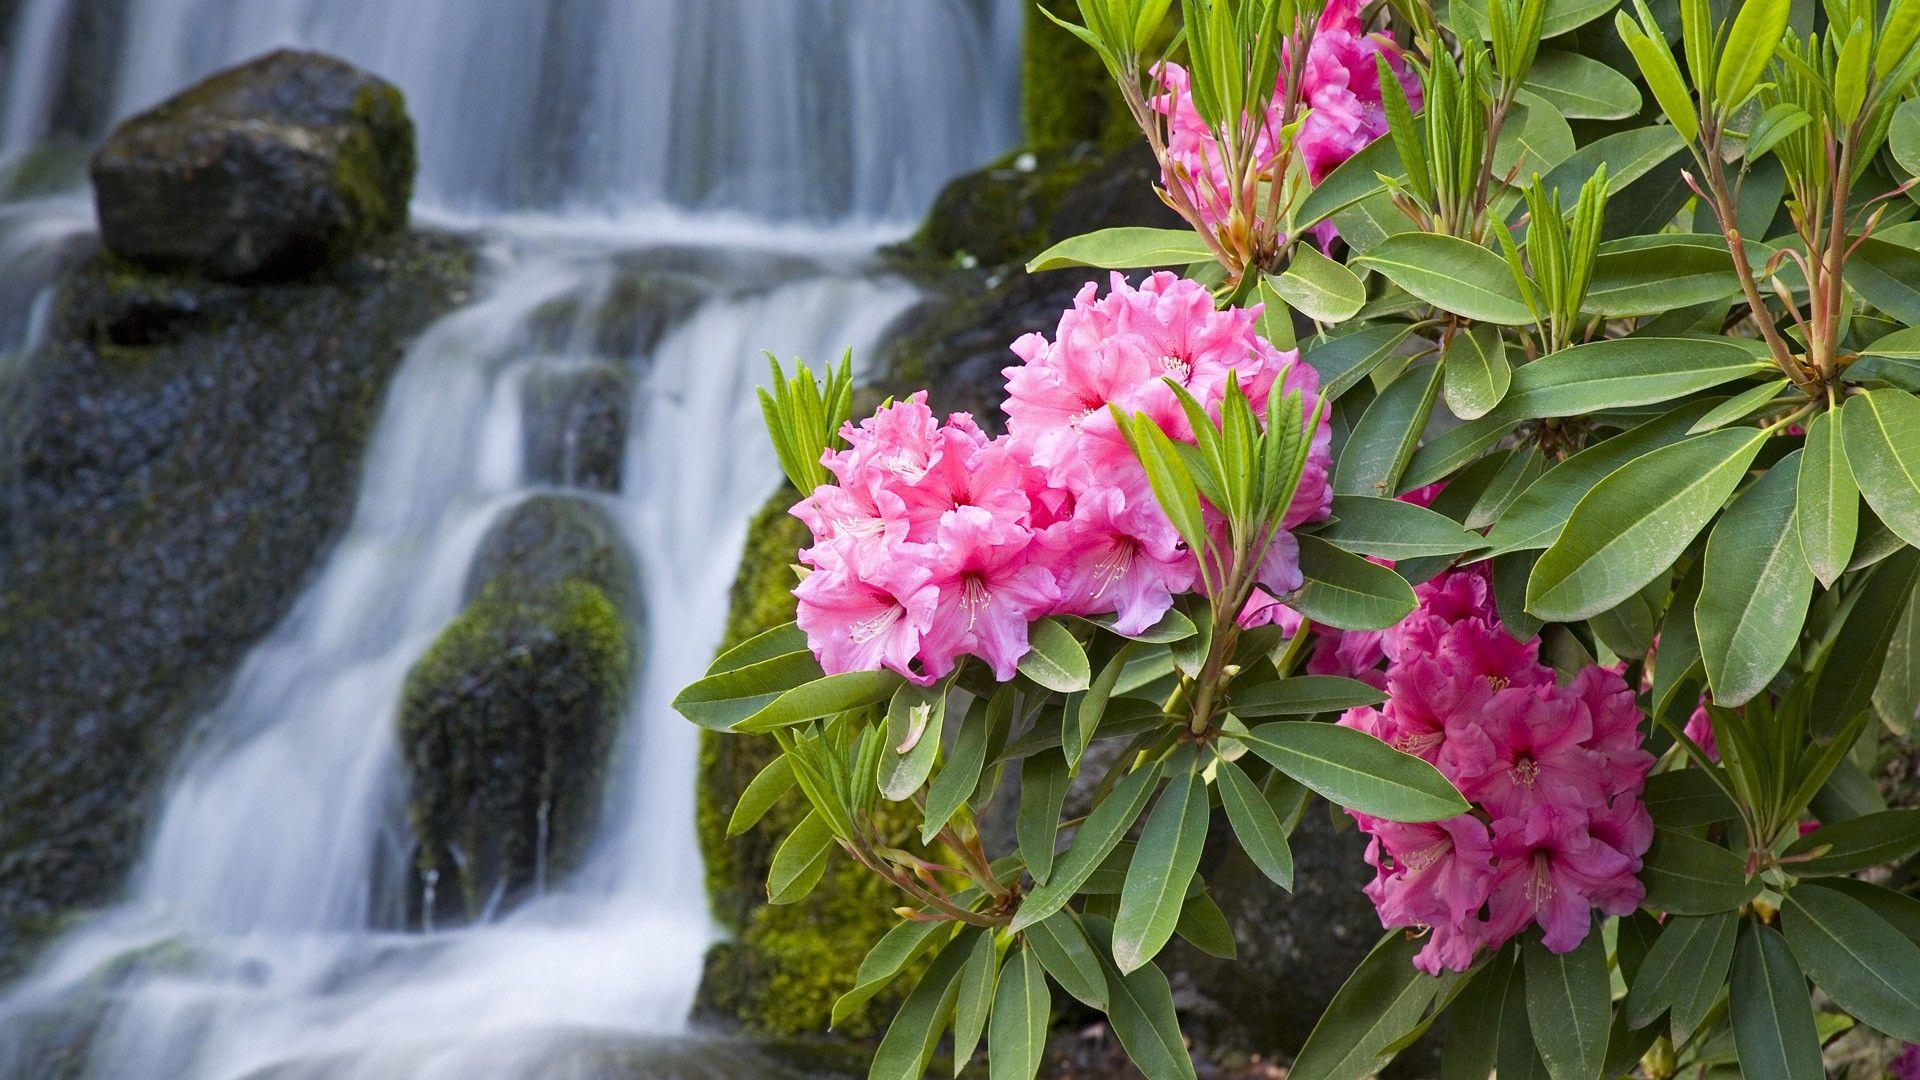 Flower Wallpaper Bing Images Spring Wallpaper Spring Wallpaper Hd Waterfall Wallpaper